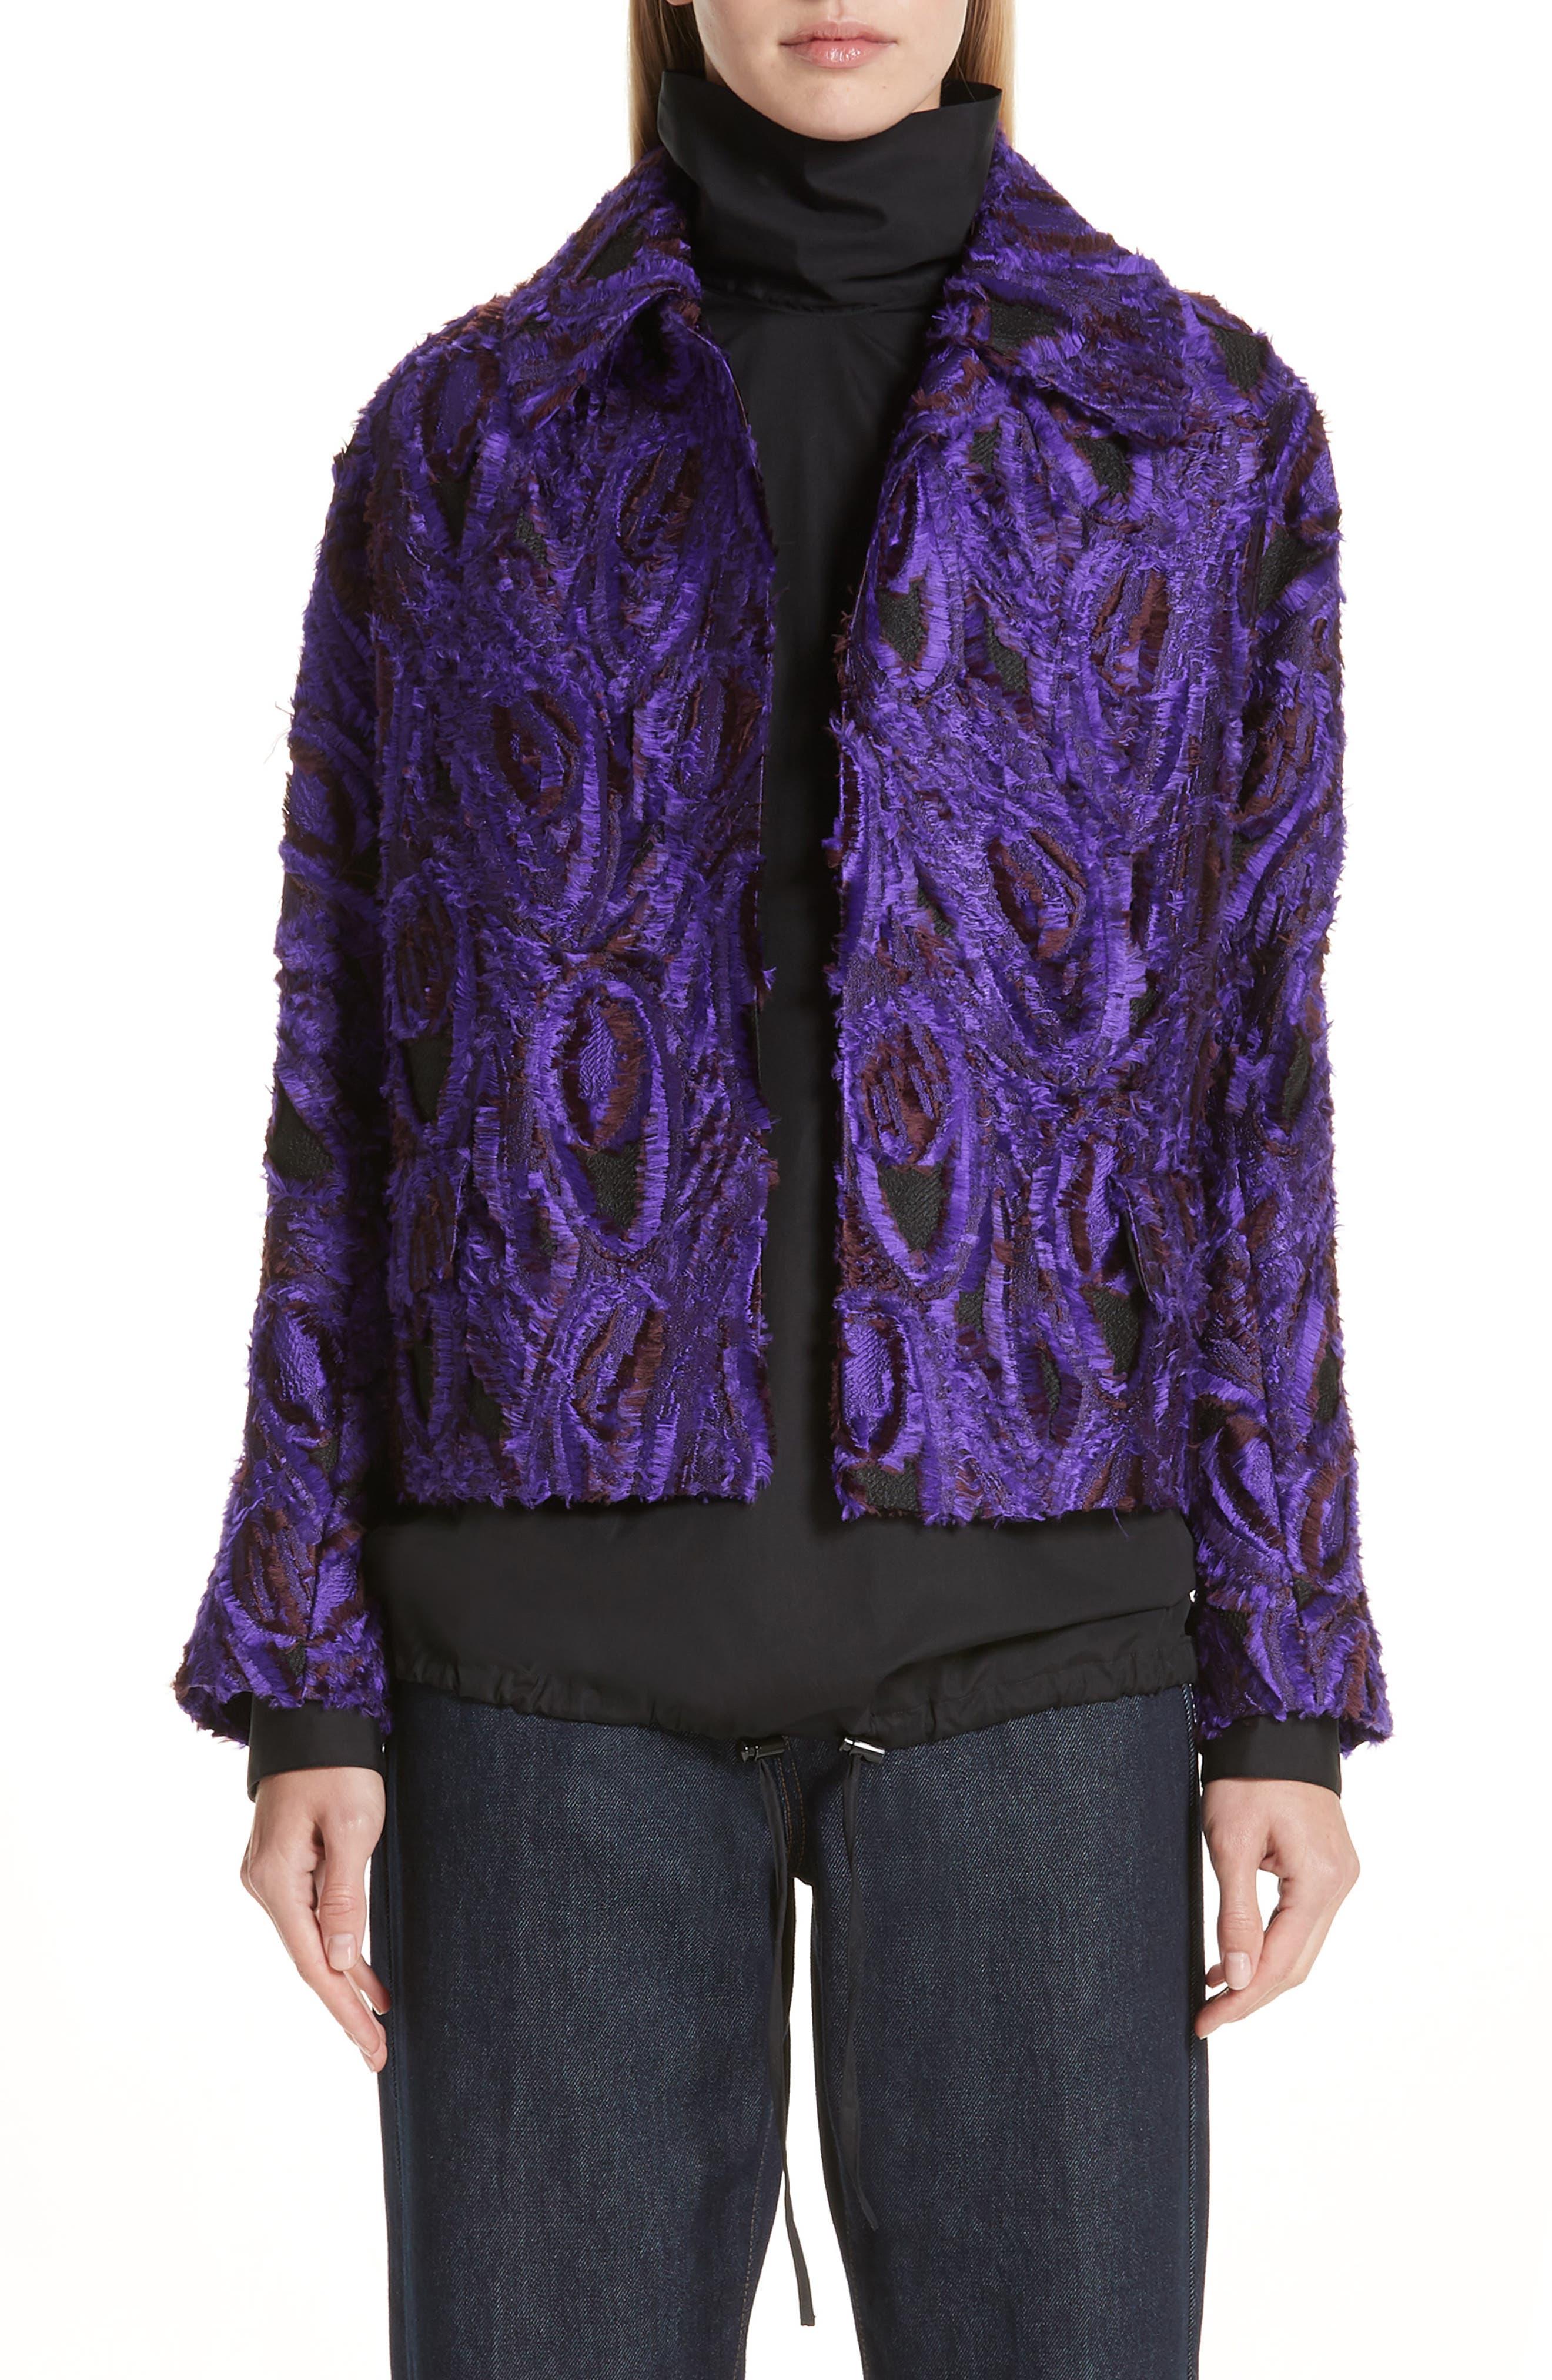 Peacock 3D Jacquard Jacket,                             Main thumbnail 1, color,                             500